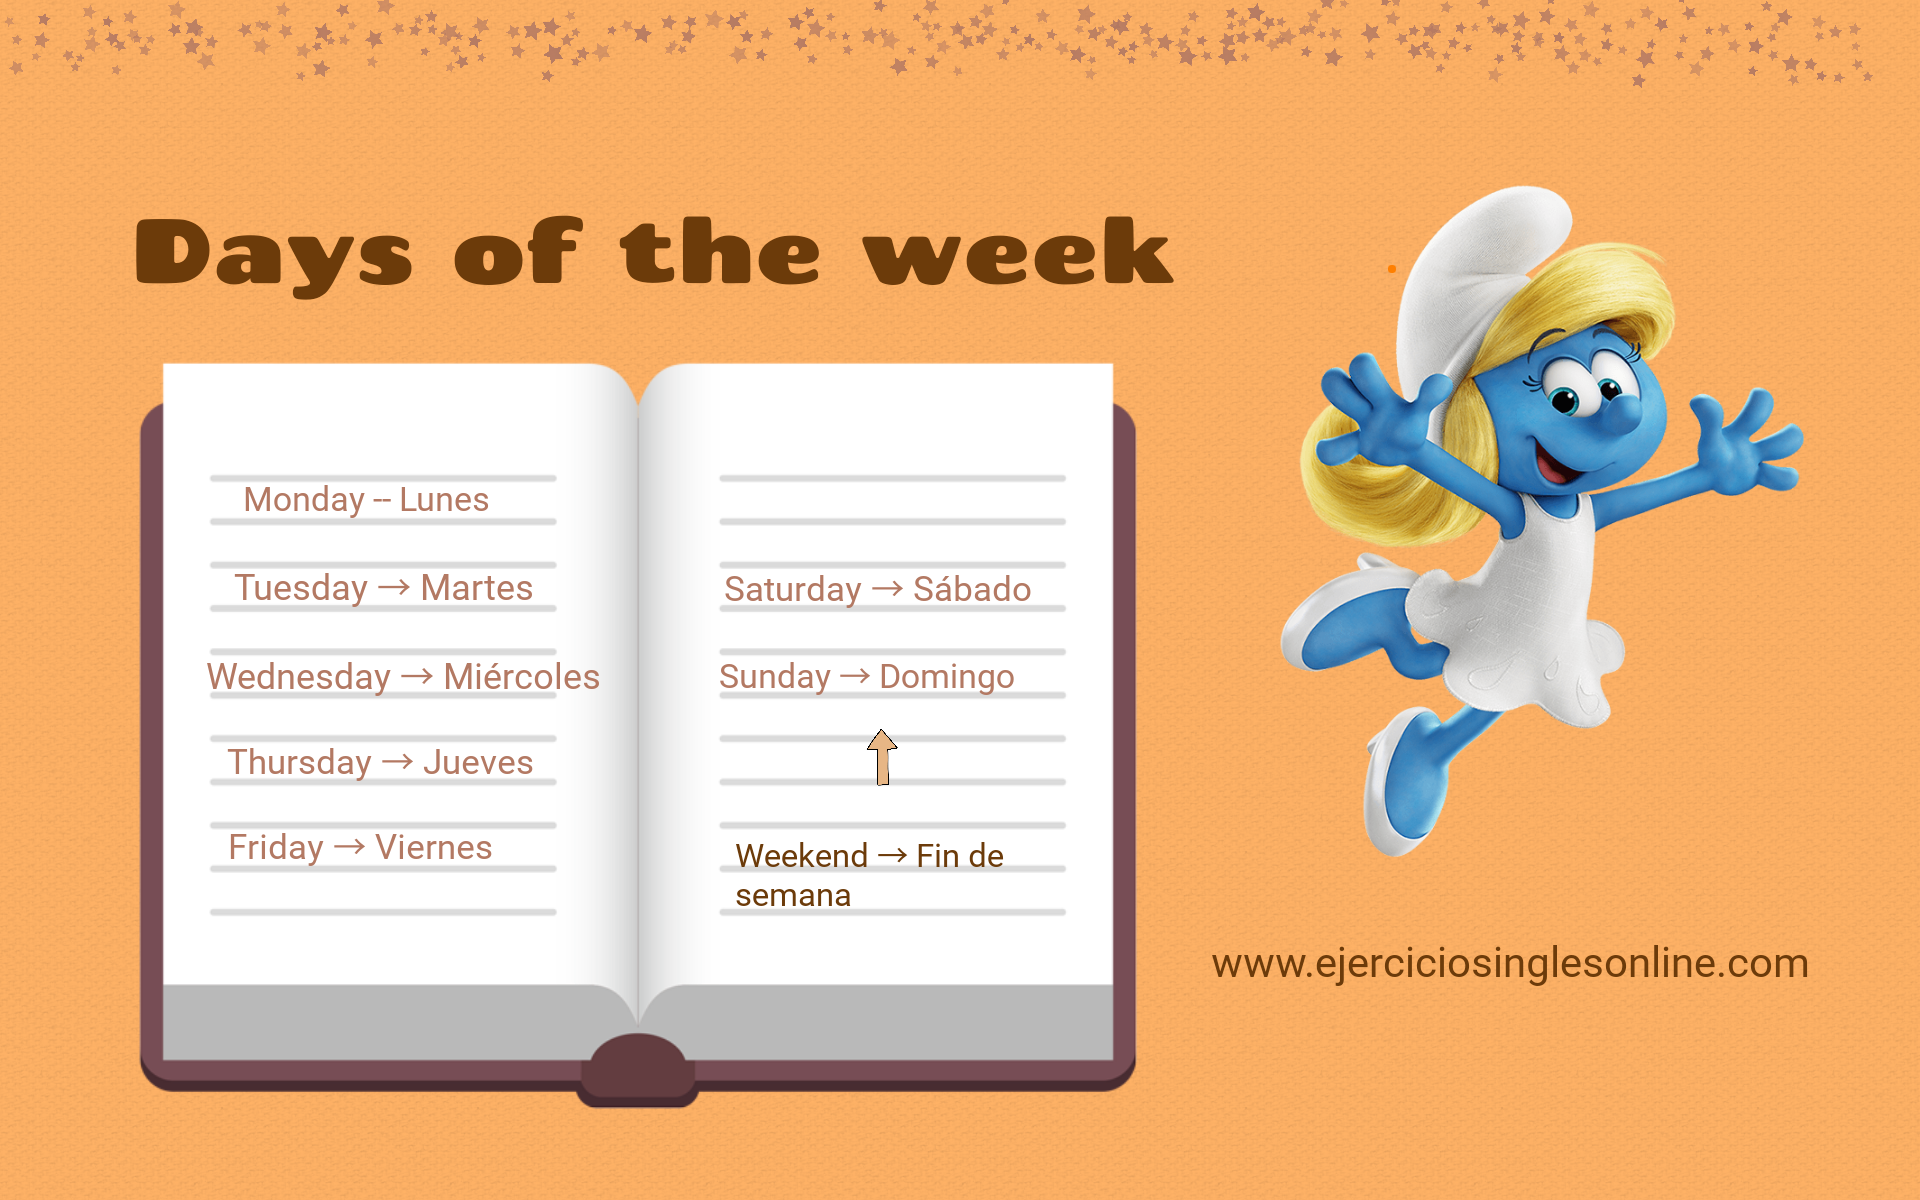 Días de la semana en inglés - Ejercicios inglés online